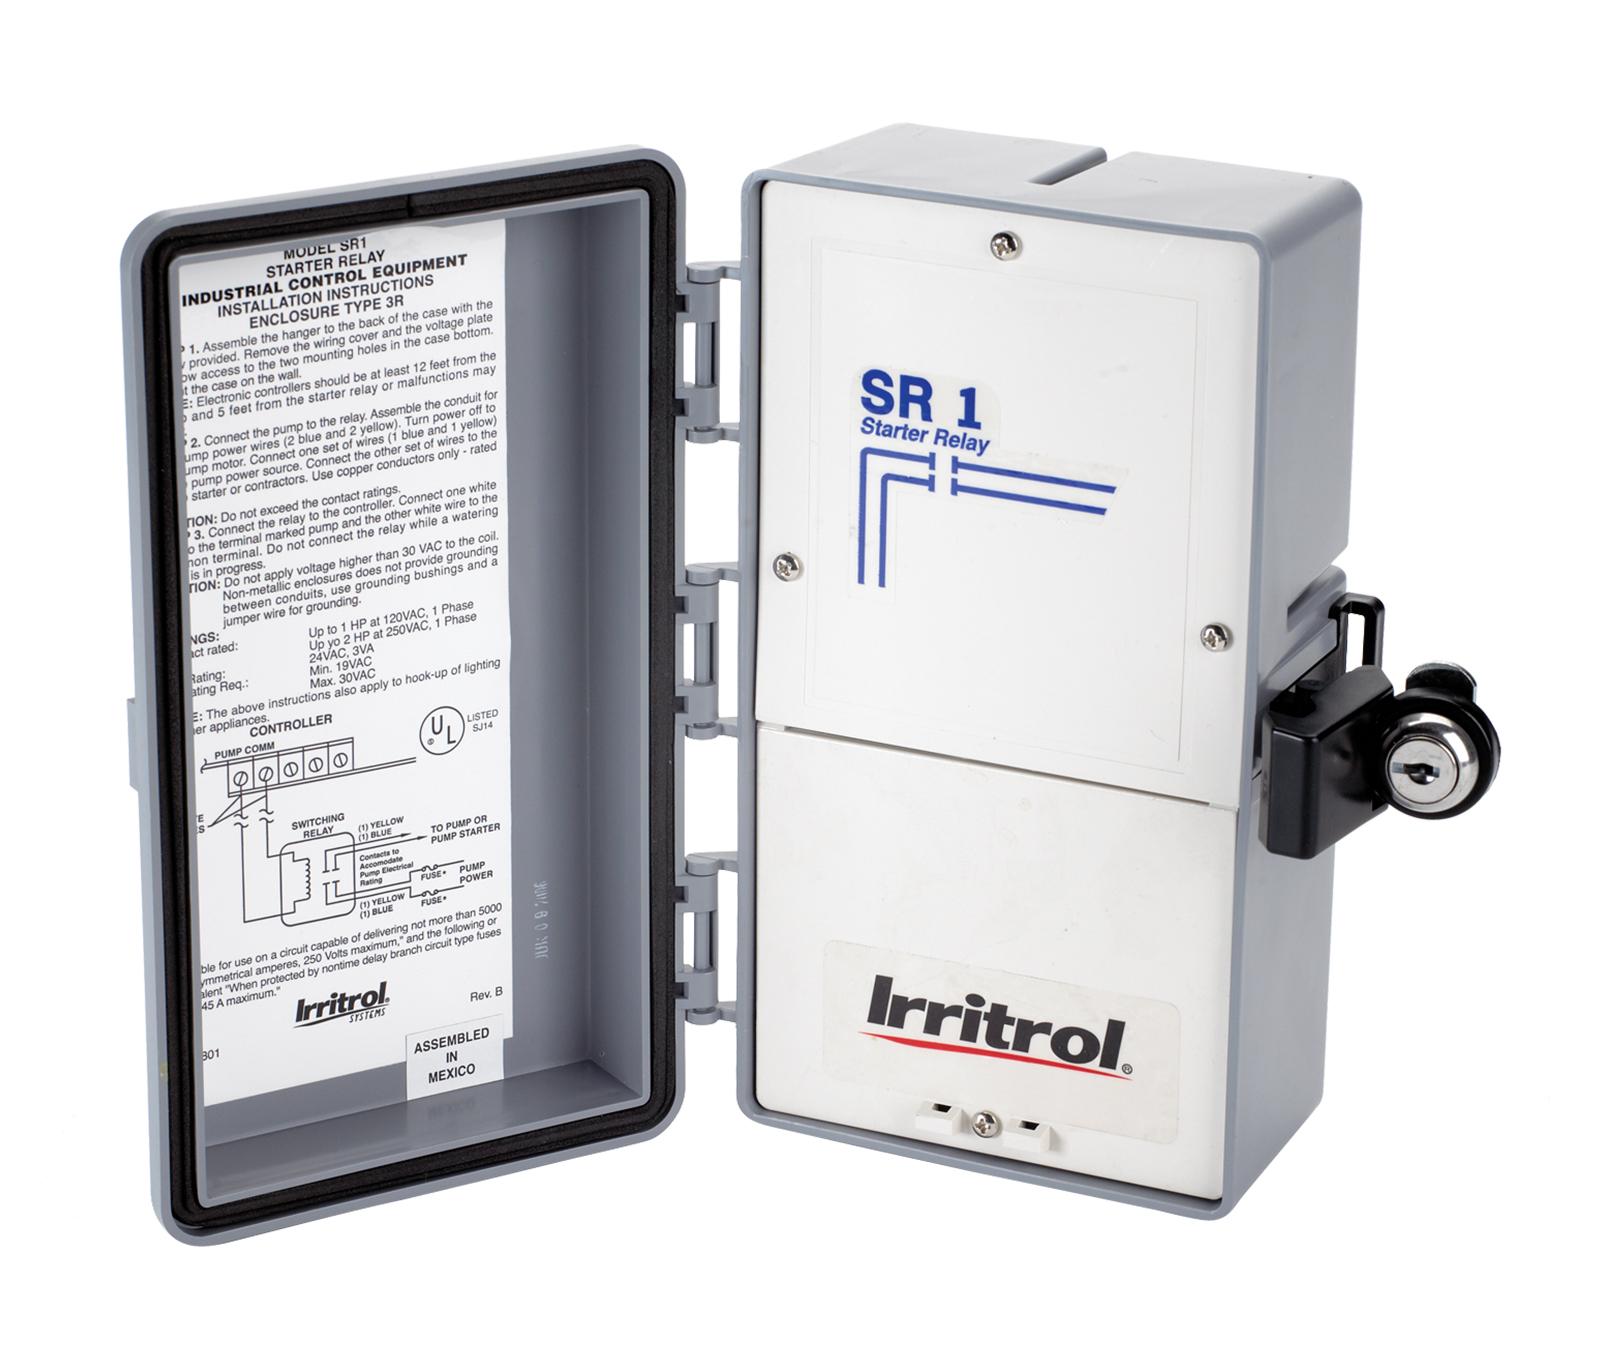 Irritrol Sr1pumpstarrelay. Sr1 Pump Star Relay. Wiring. Relay For Irrigation Pump Wiring Diagram At Scoala.co